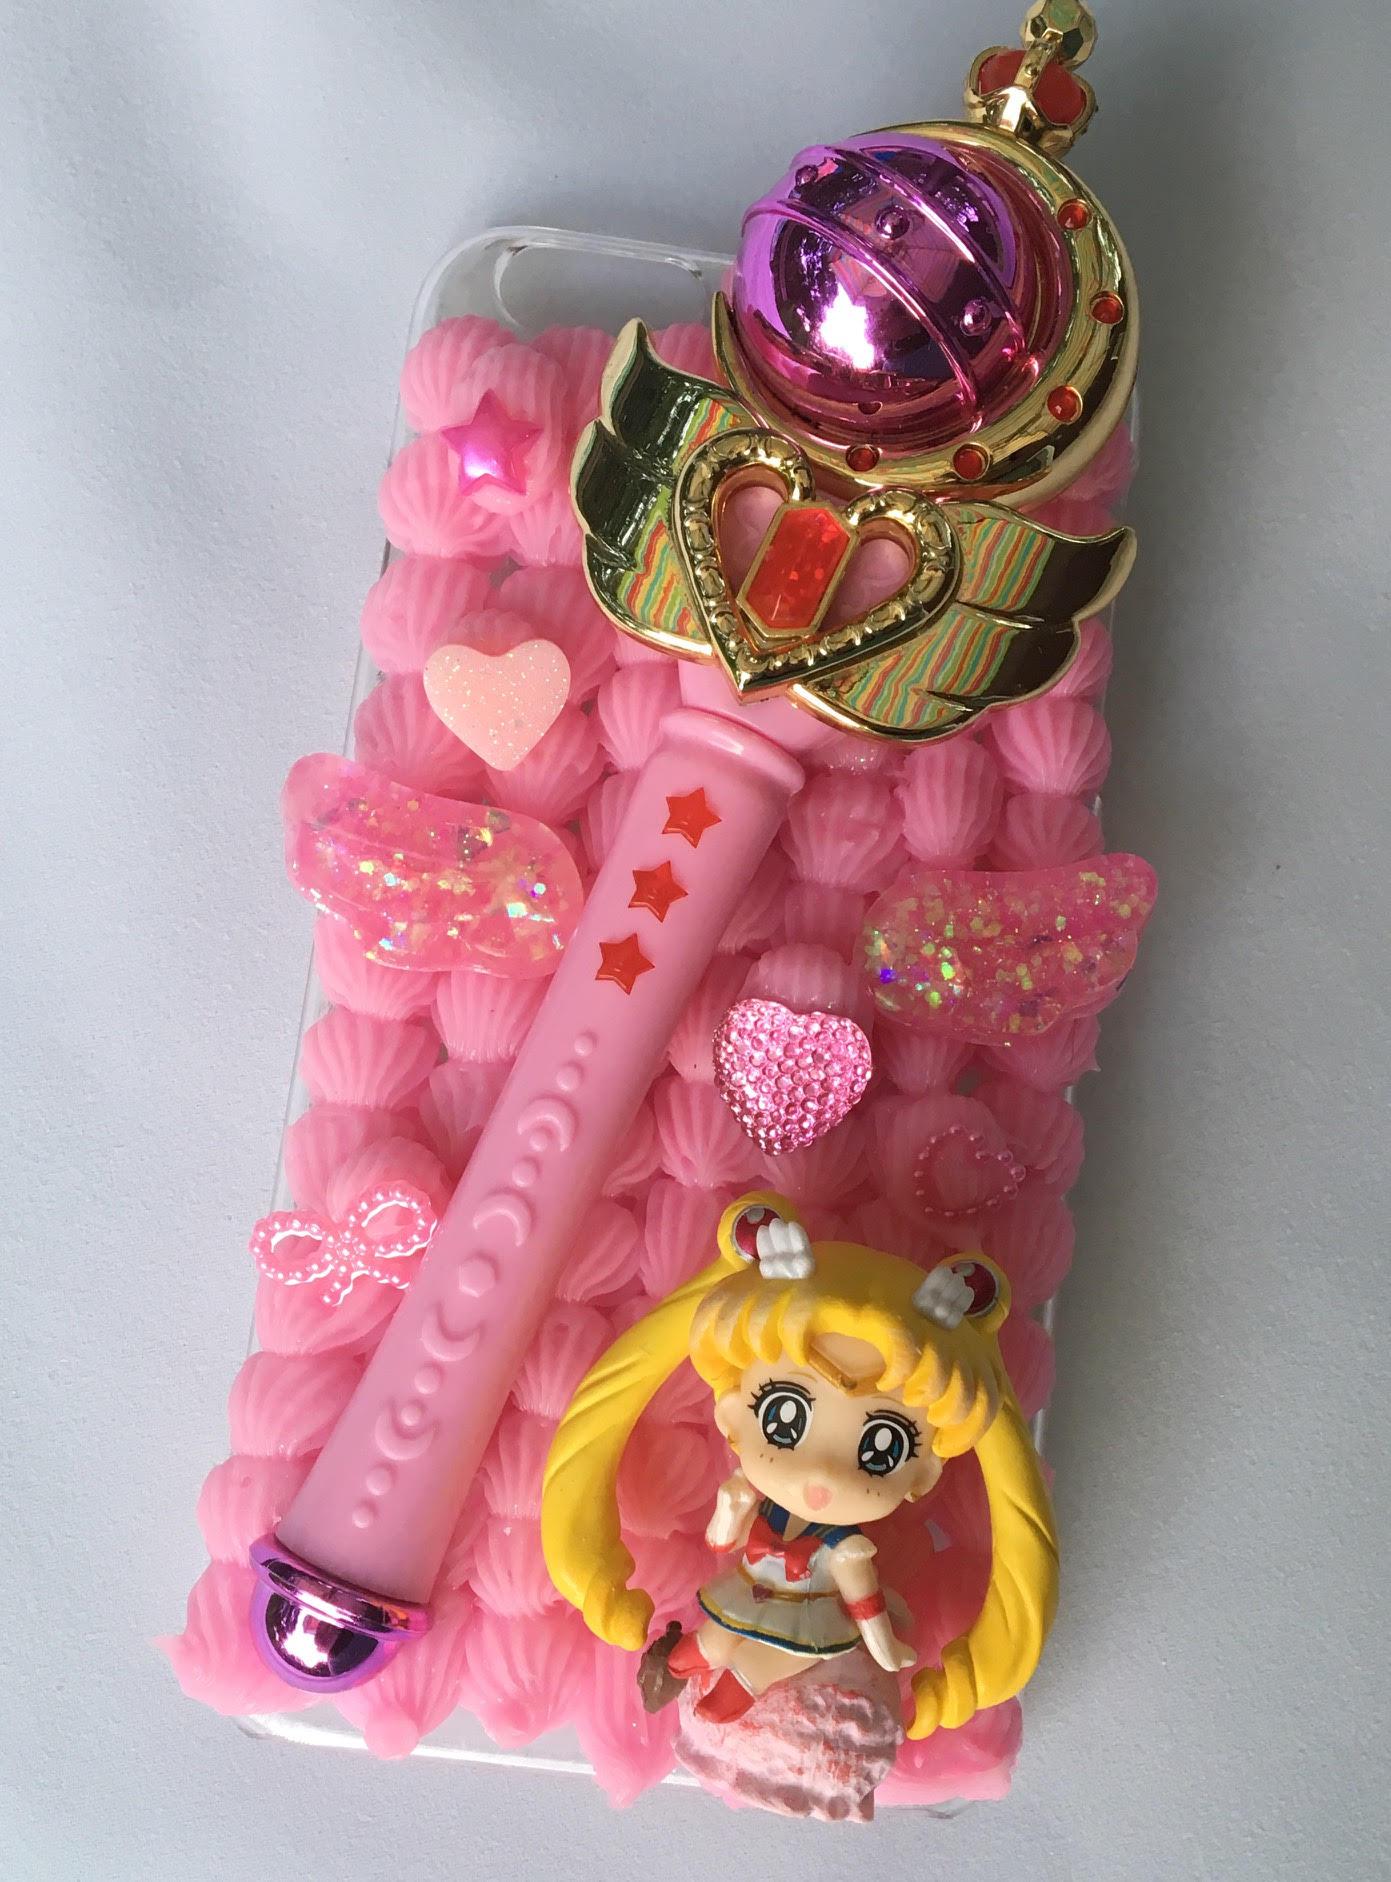 Sailor Moon iPhone 6 Plus Case [SOLD]